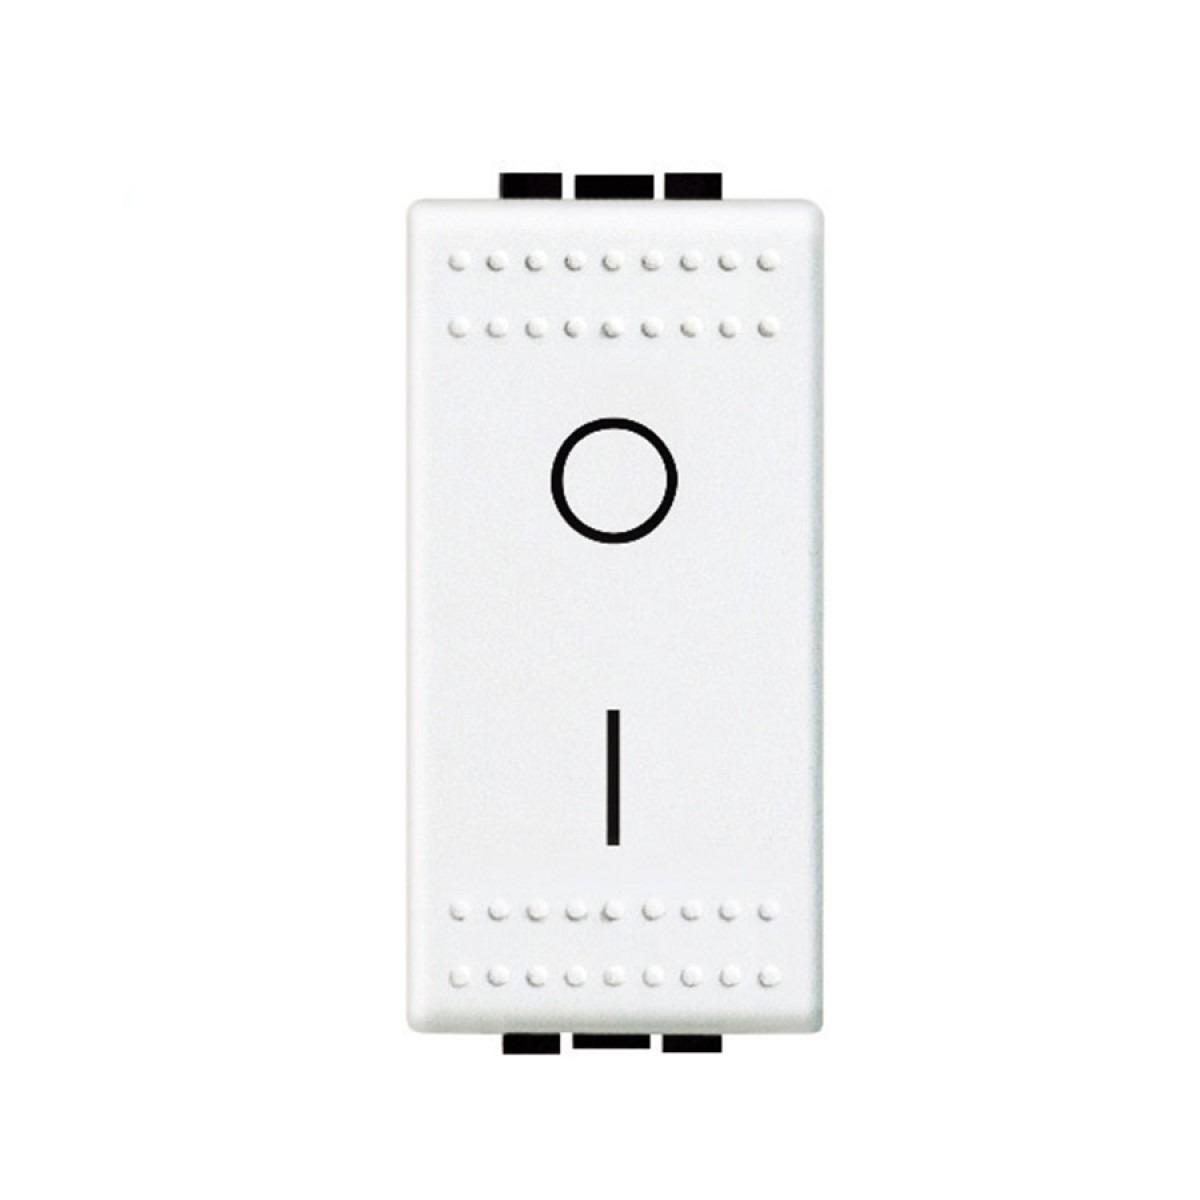 Modulo Interruptor Bipolar 1 Modulo 16A - Branco - Livinglight - Bticino